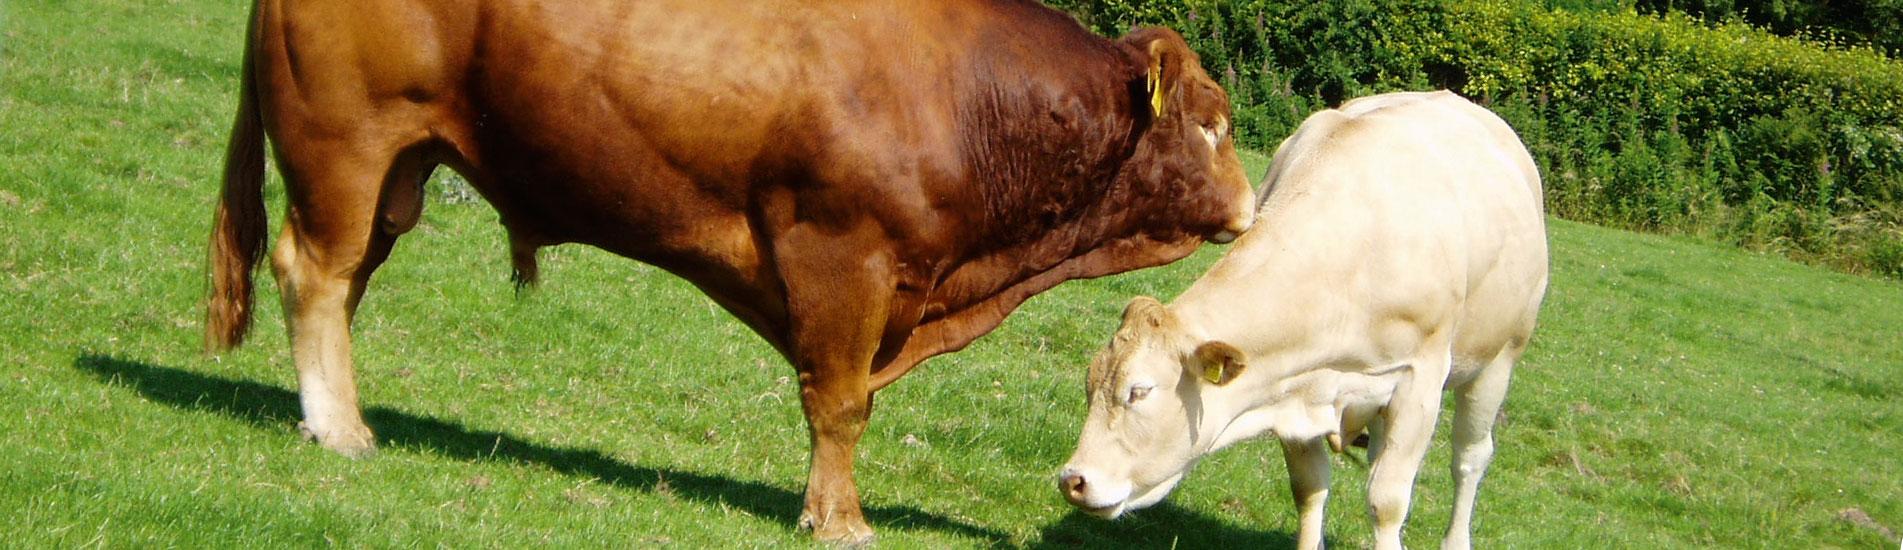 Beef animals at Kimbland Farm, Devon